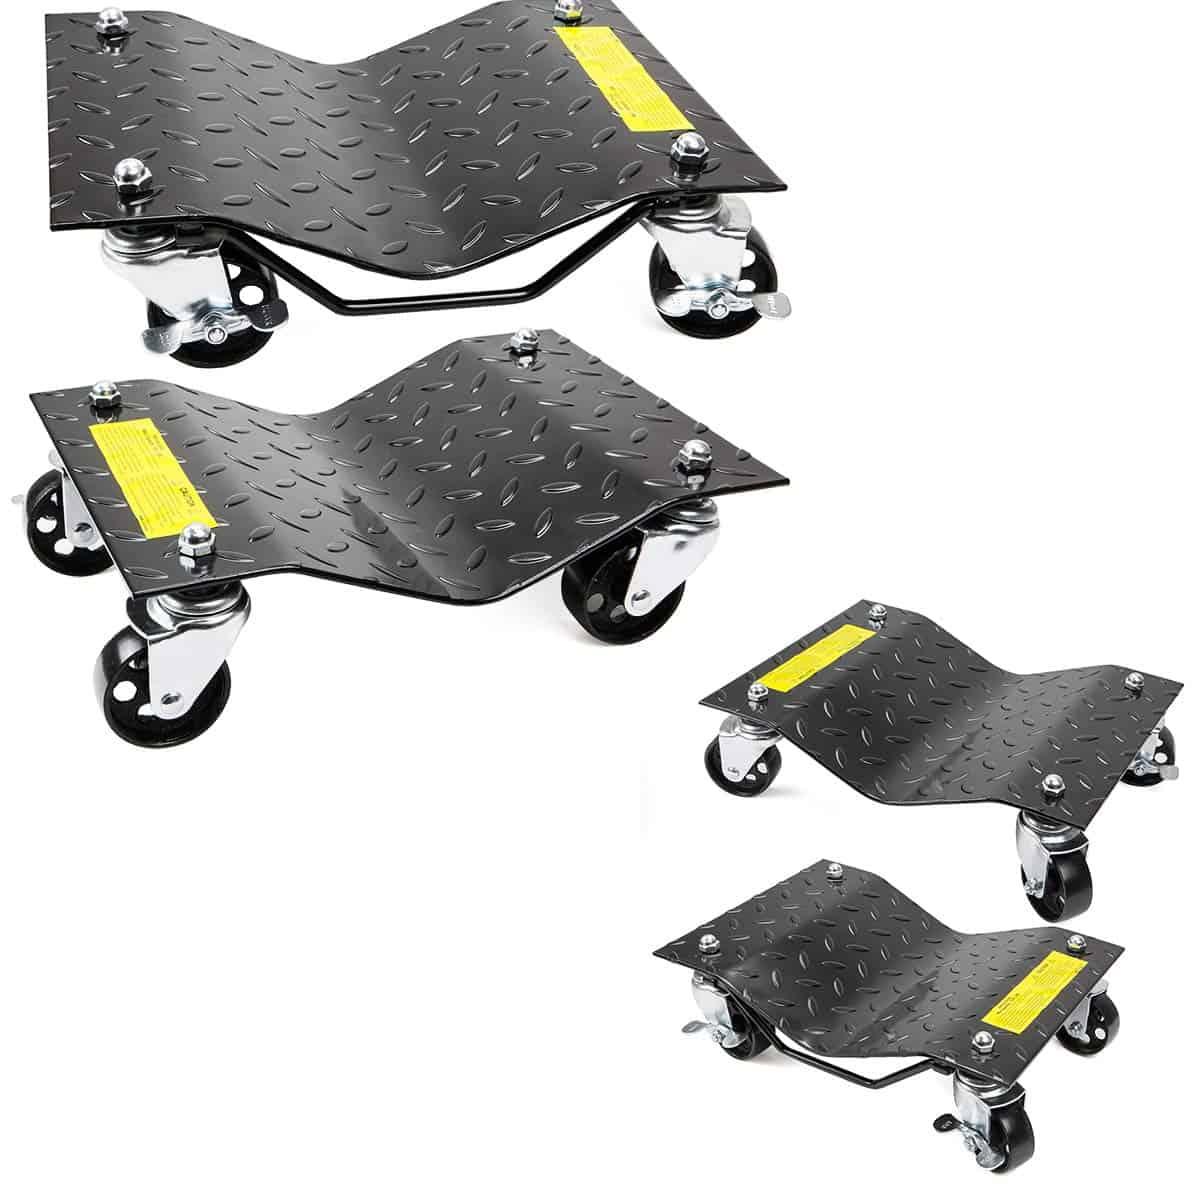 XtremepowerUS Premium Skates for Tires